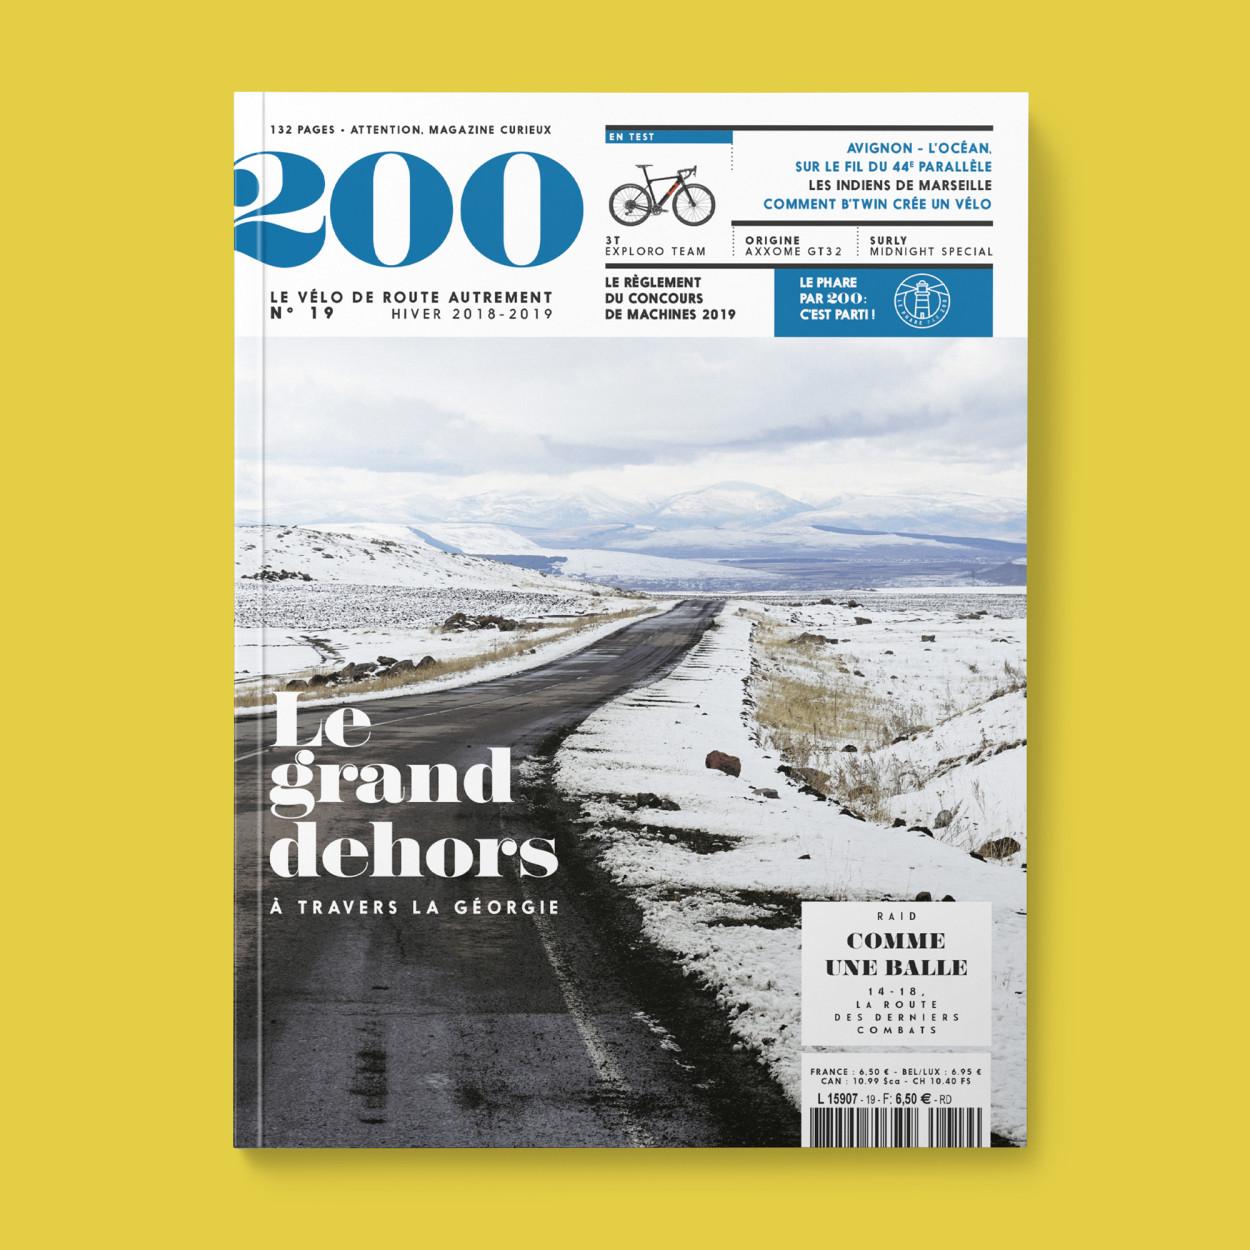 200-19-COVER-SQUARE.jpg